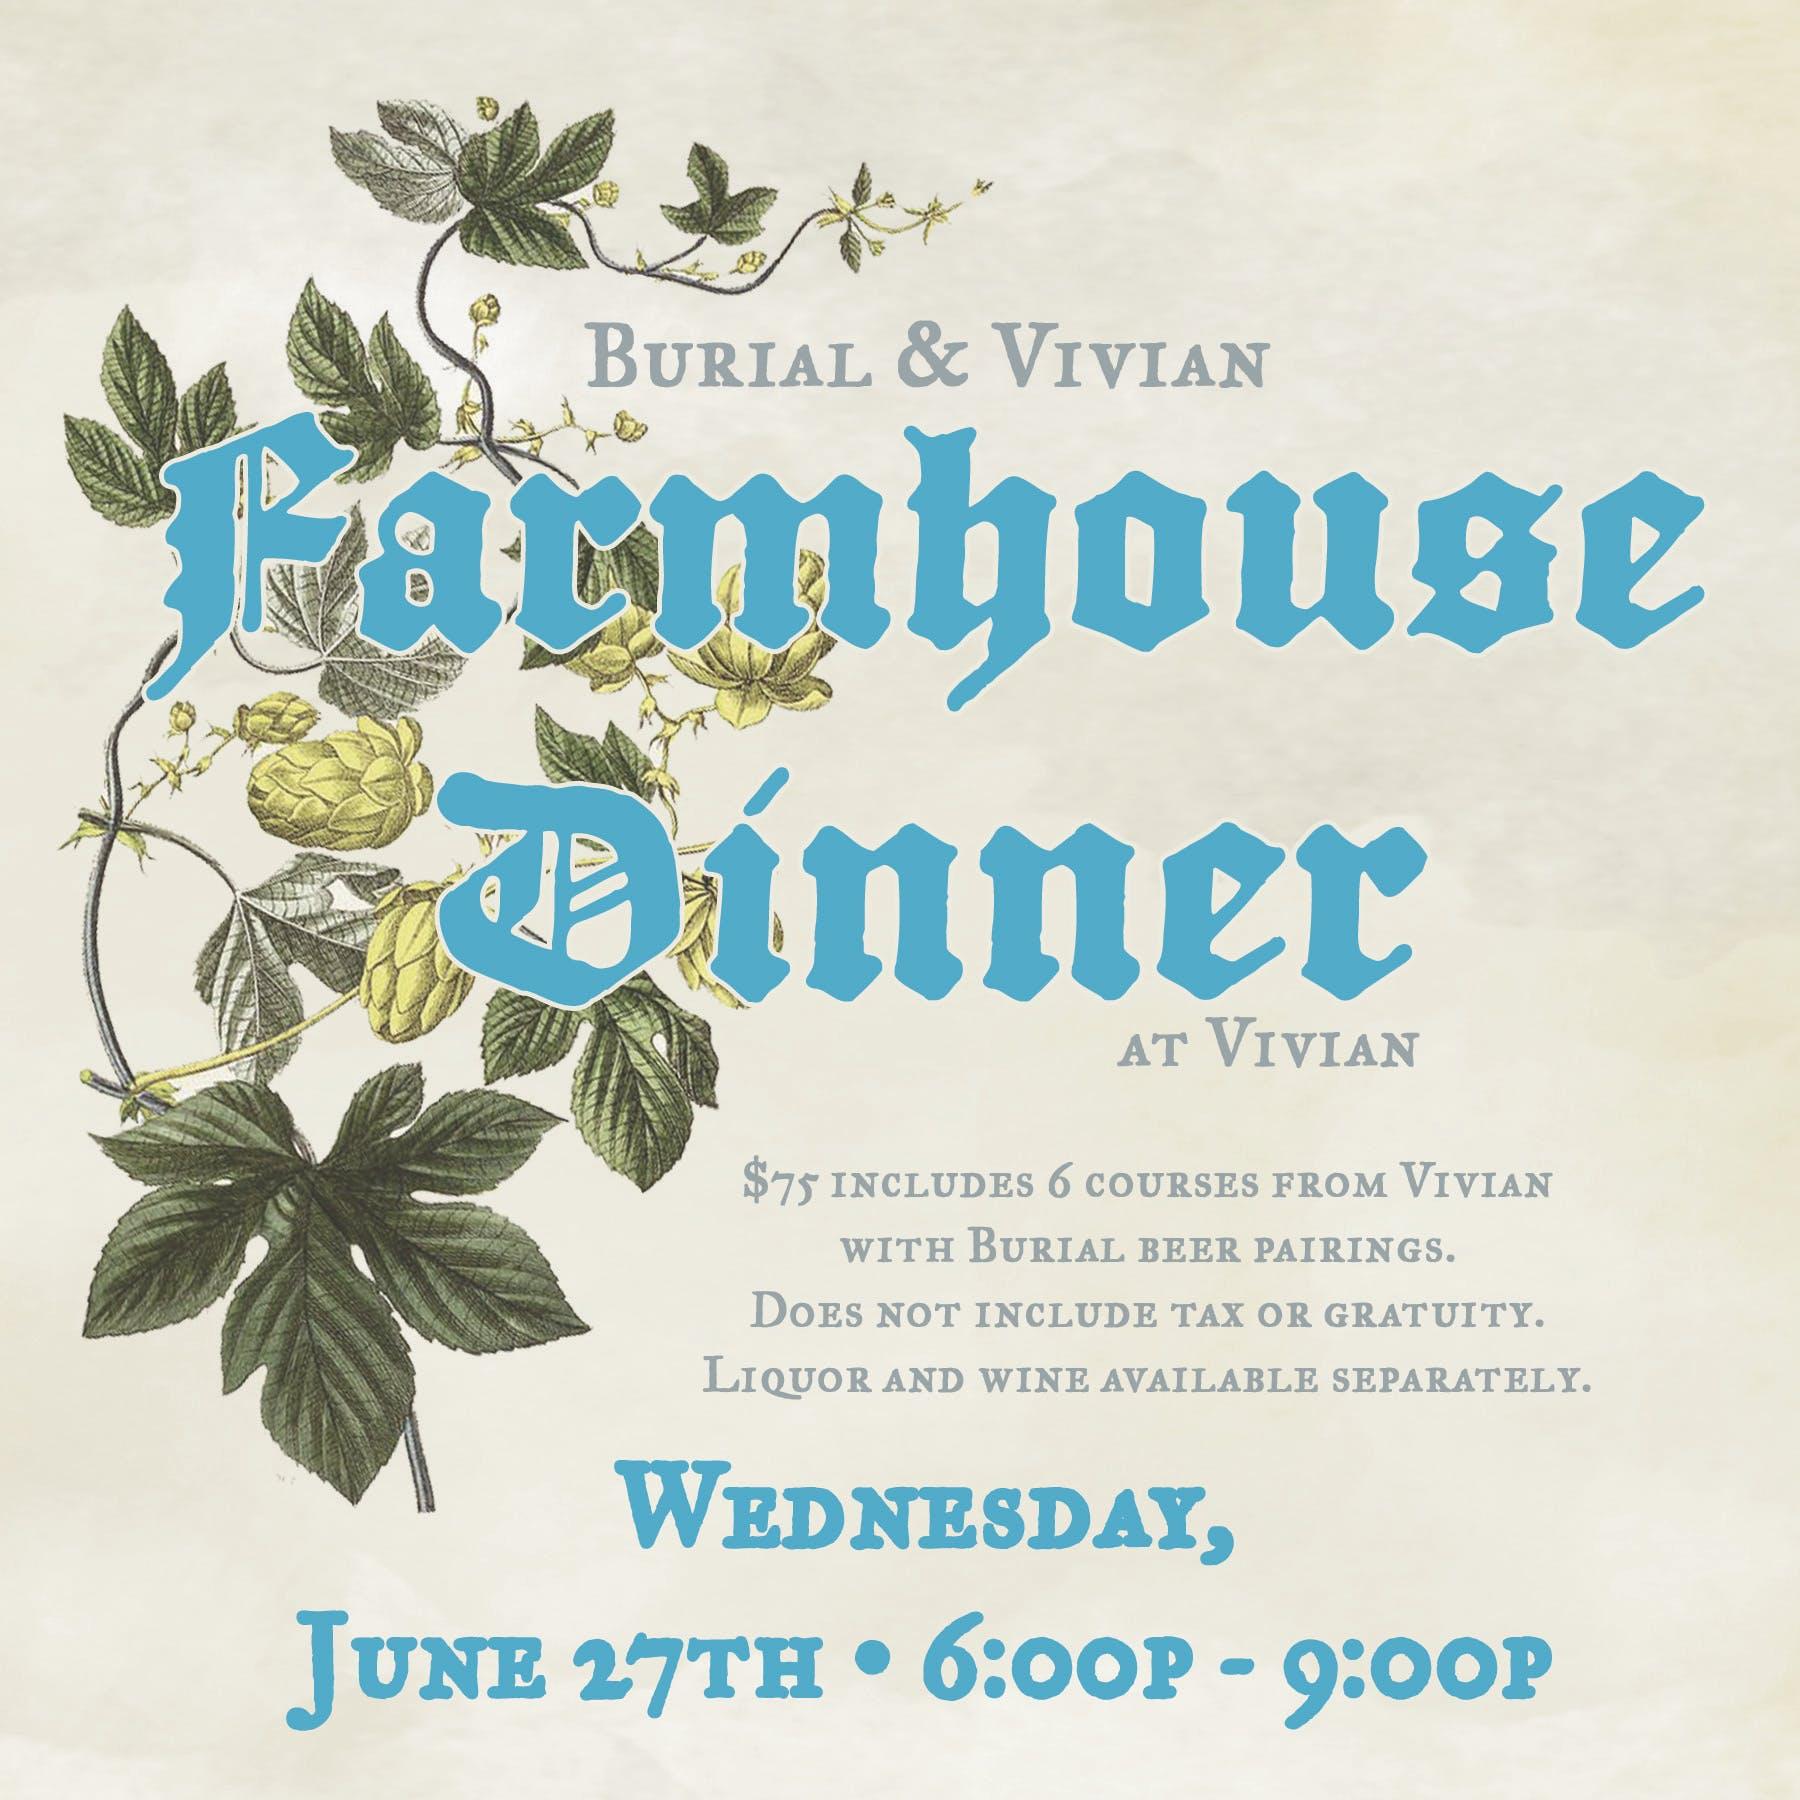 Burial and Vivian Farmhouse Dinner